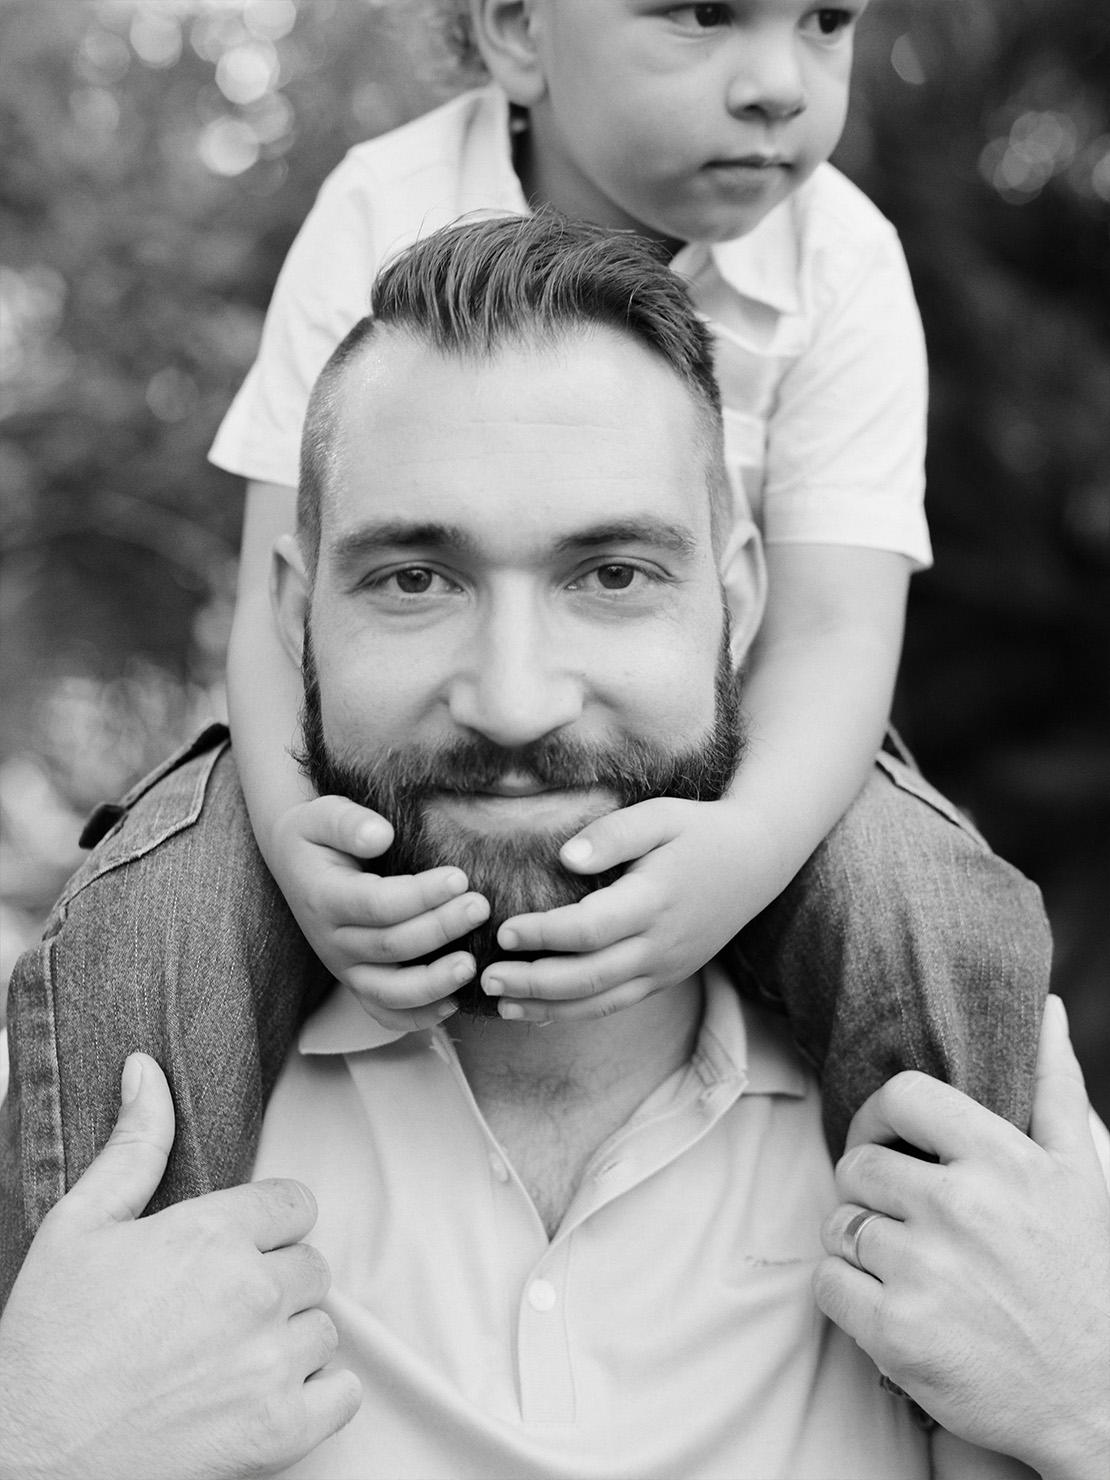 Heidi Vail Photography | Winter Park Florida Family Portrait Session at Mead Botanical Garden | Fine Art Family Photographer | Based in Orlando, Florida | Fatherhood